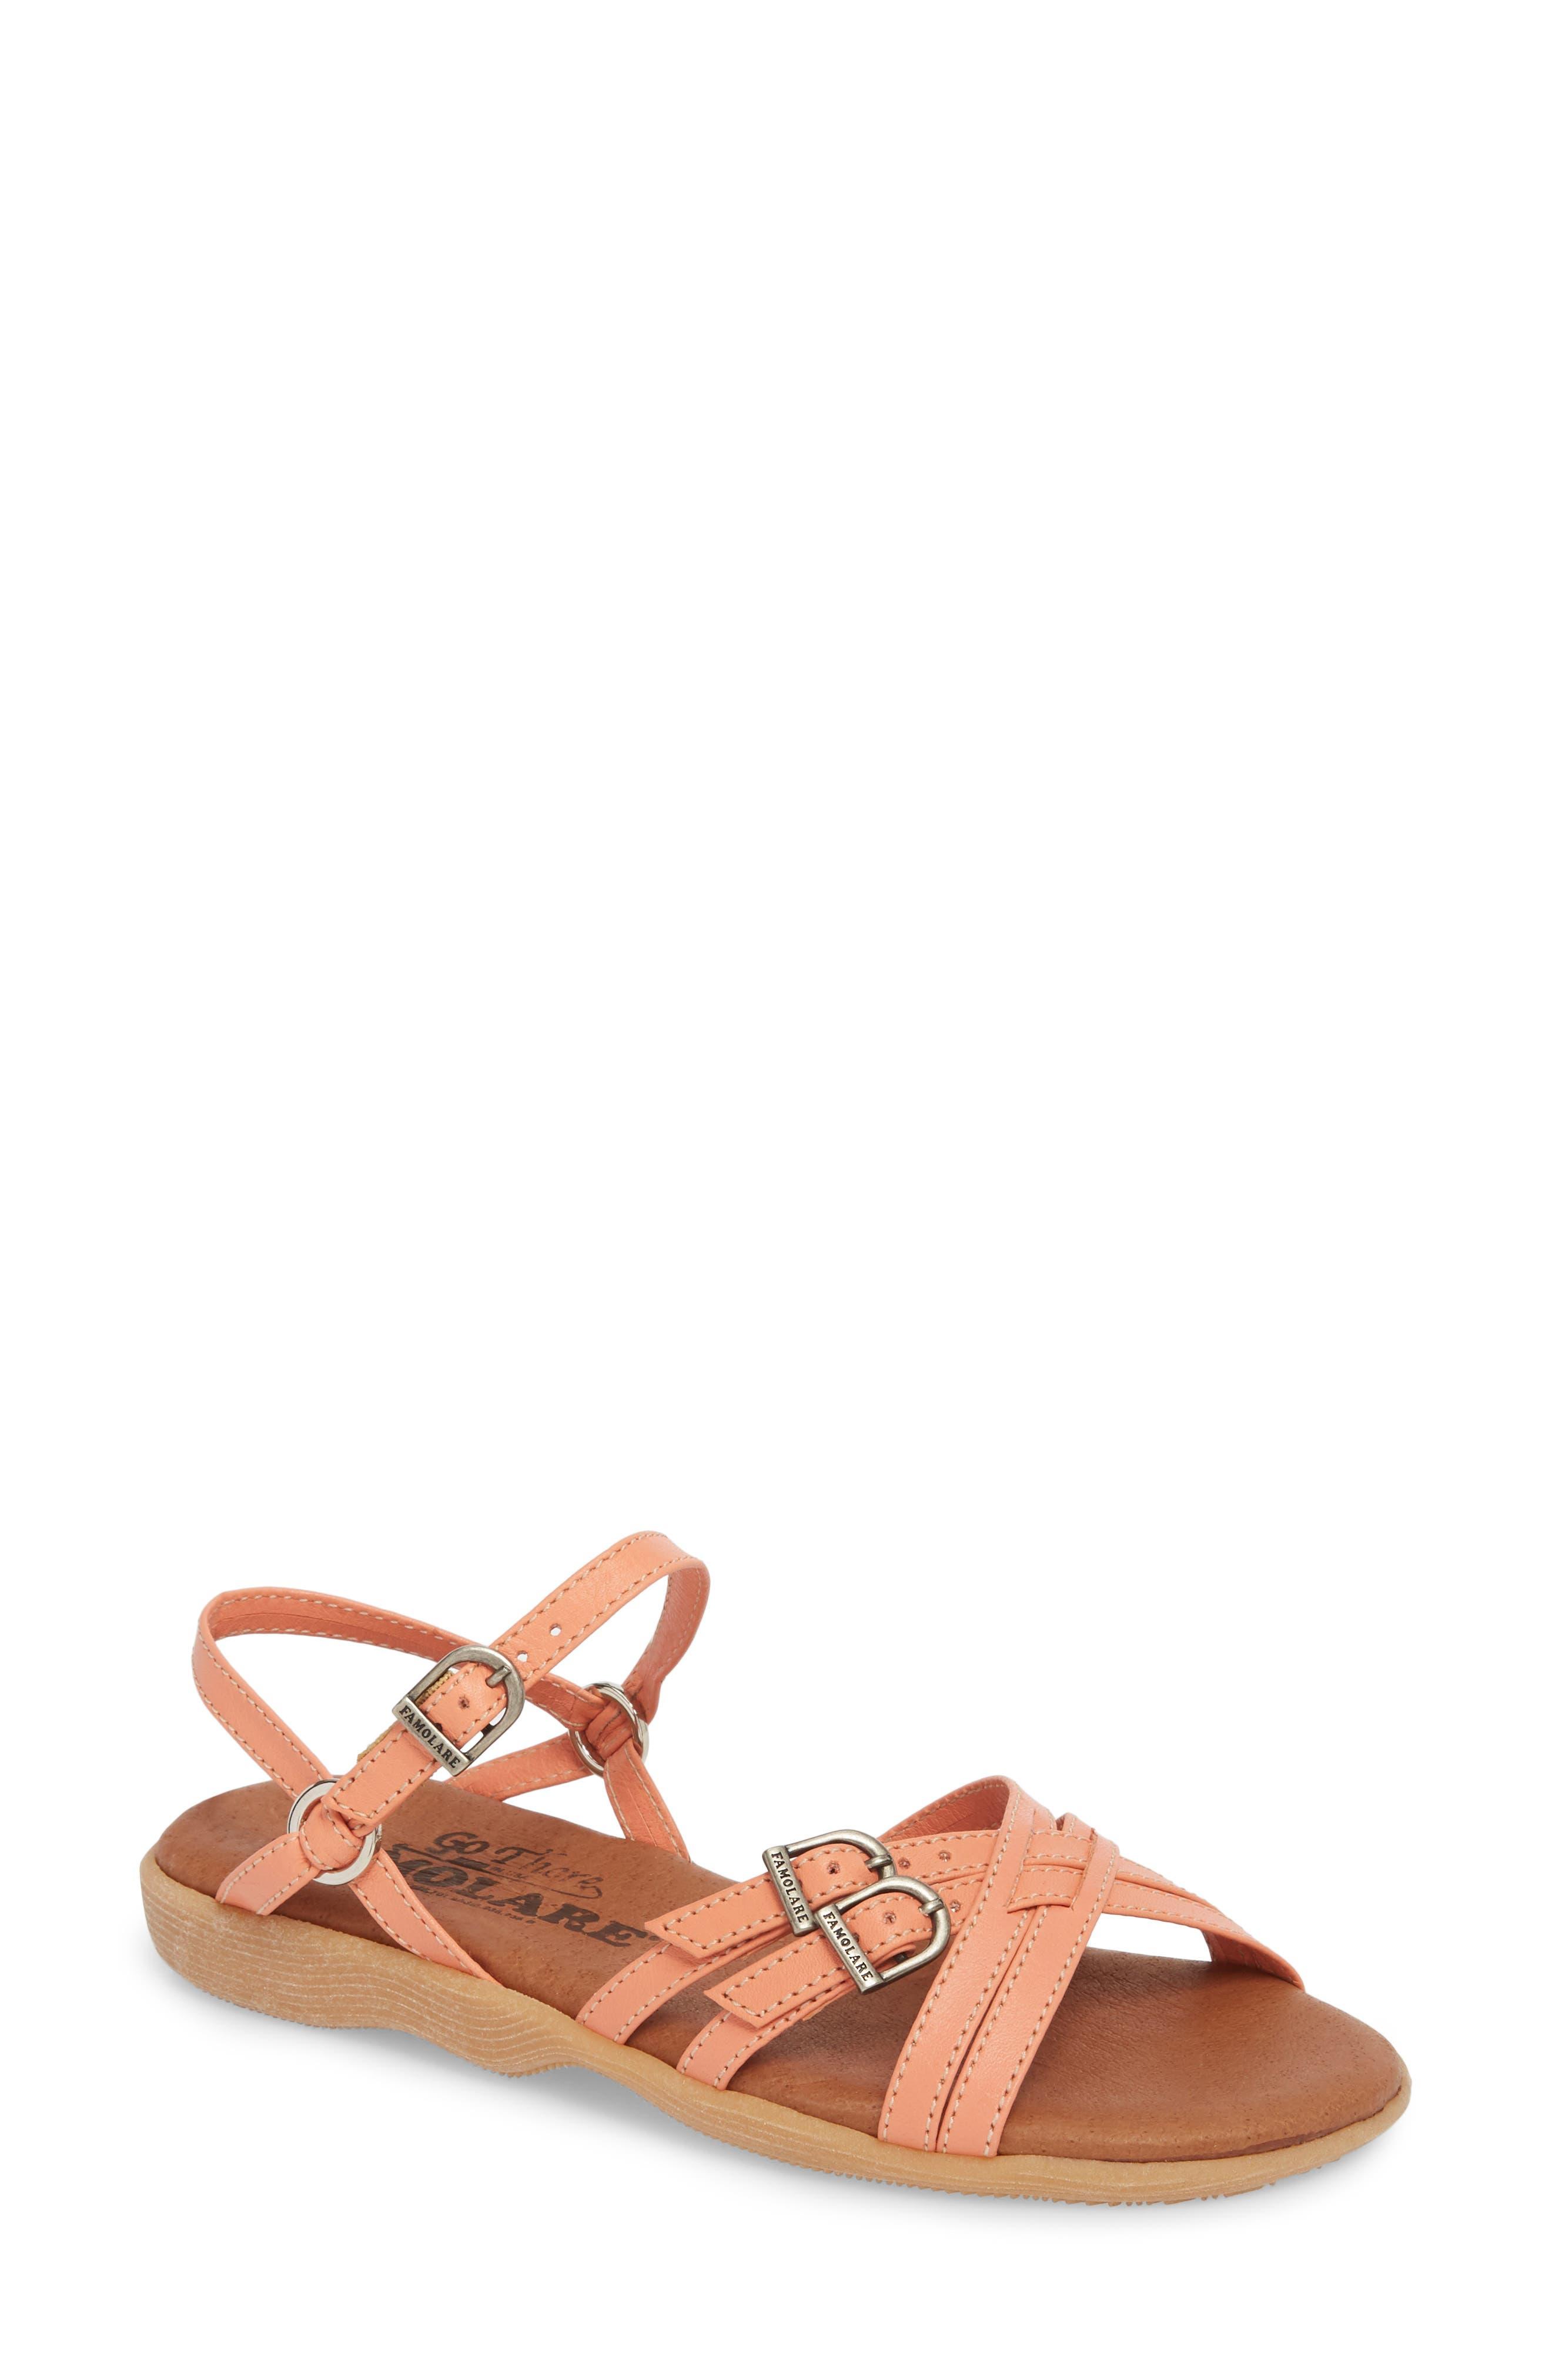 Main Image - Famolare Strapsody Buckle Sandal (Women)